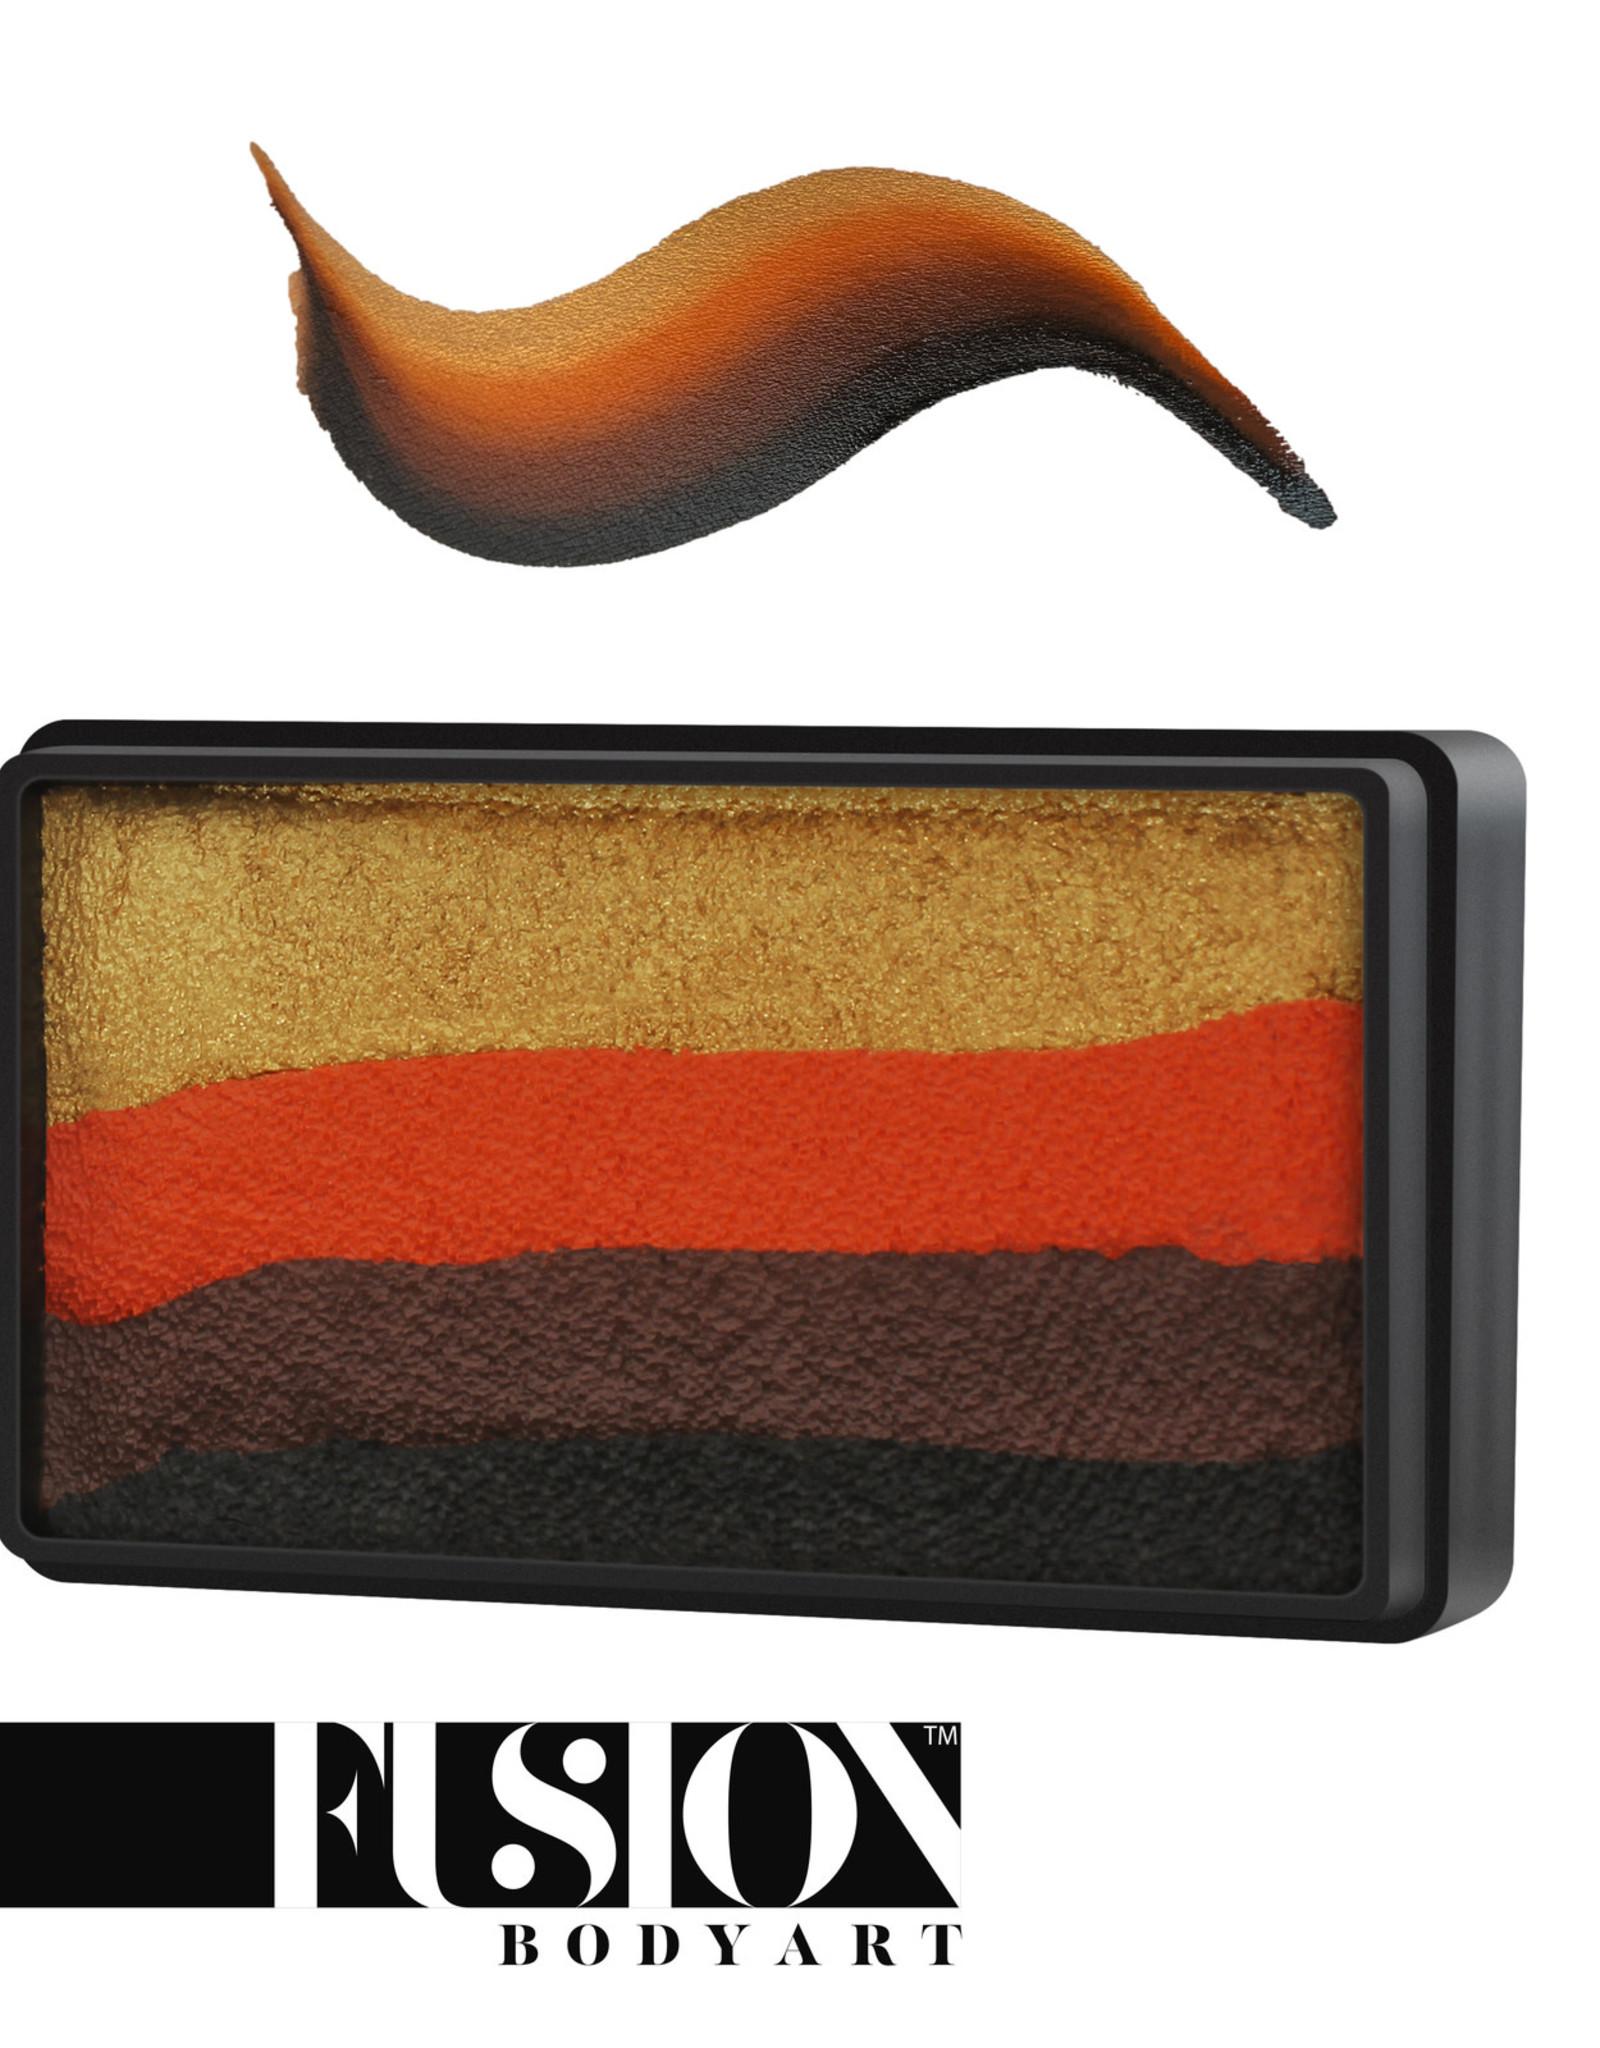 Fusion Natalee Davies Gold Range - Split Cake - Tigress 30g